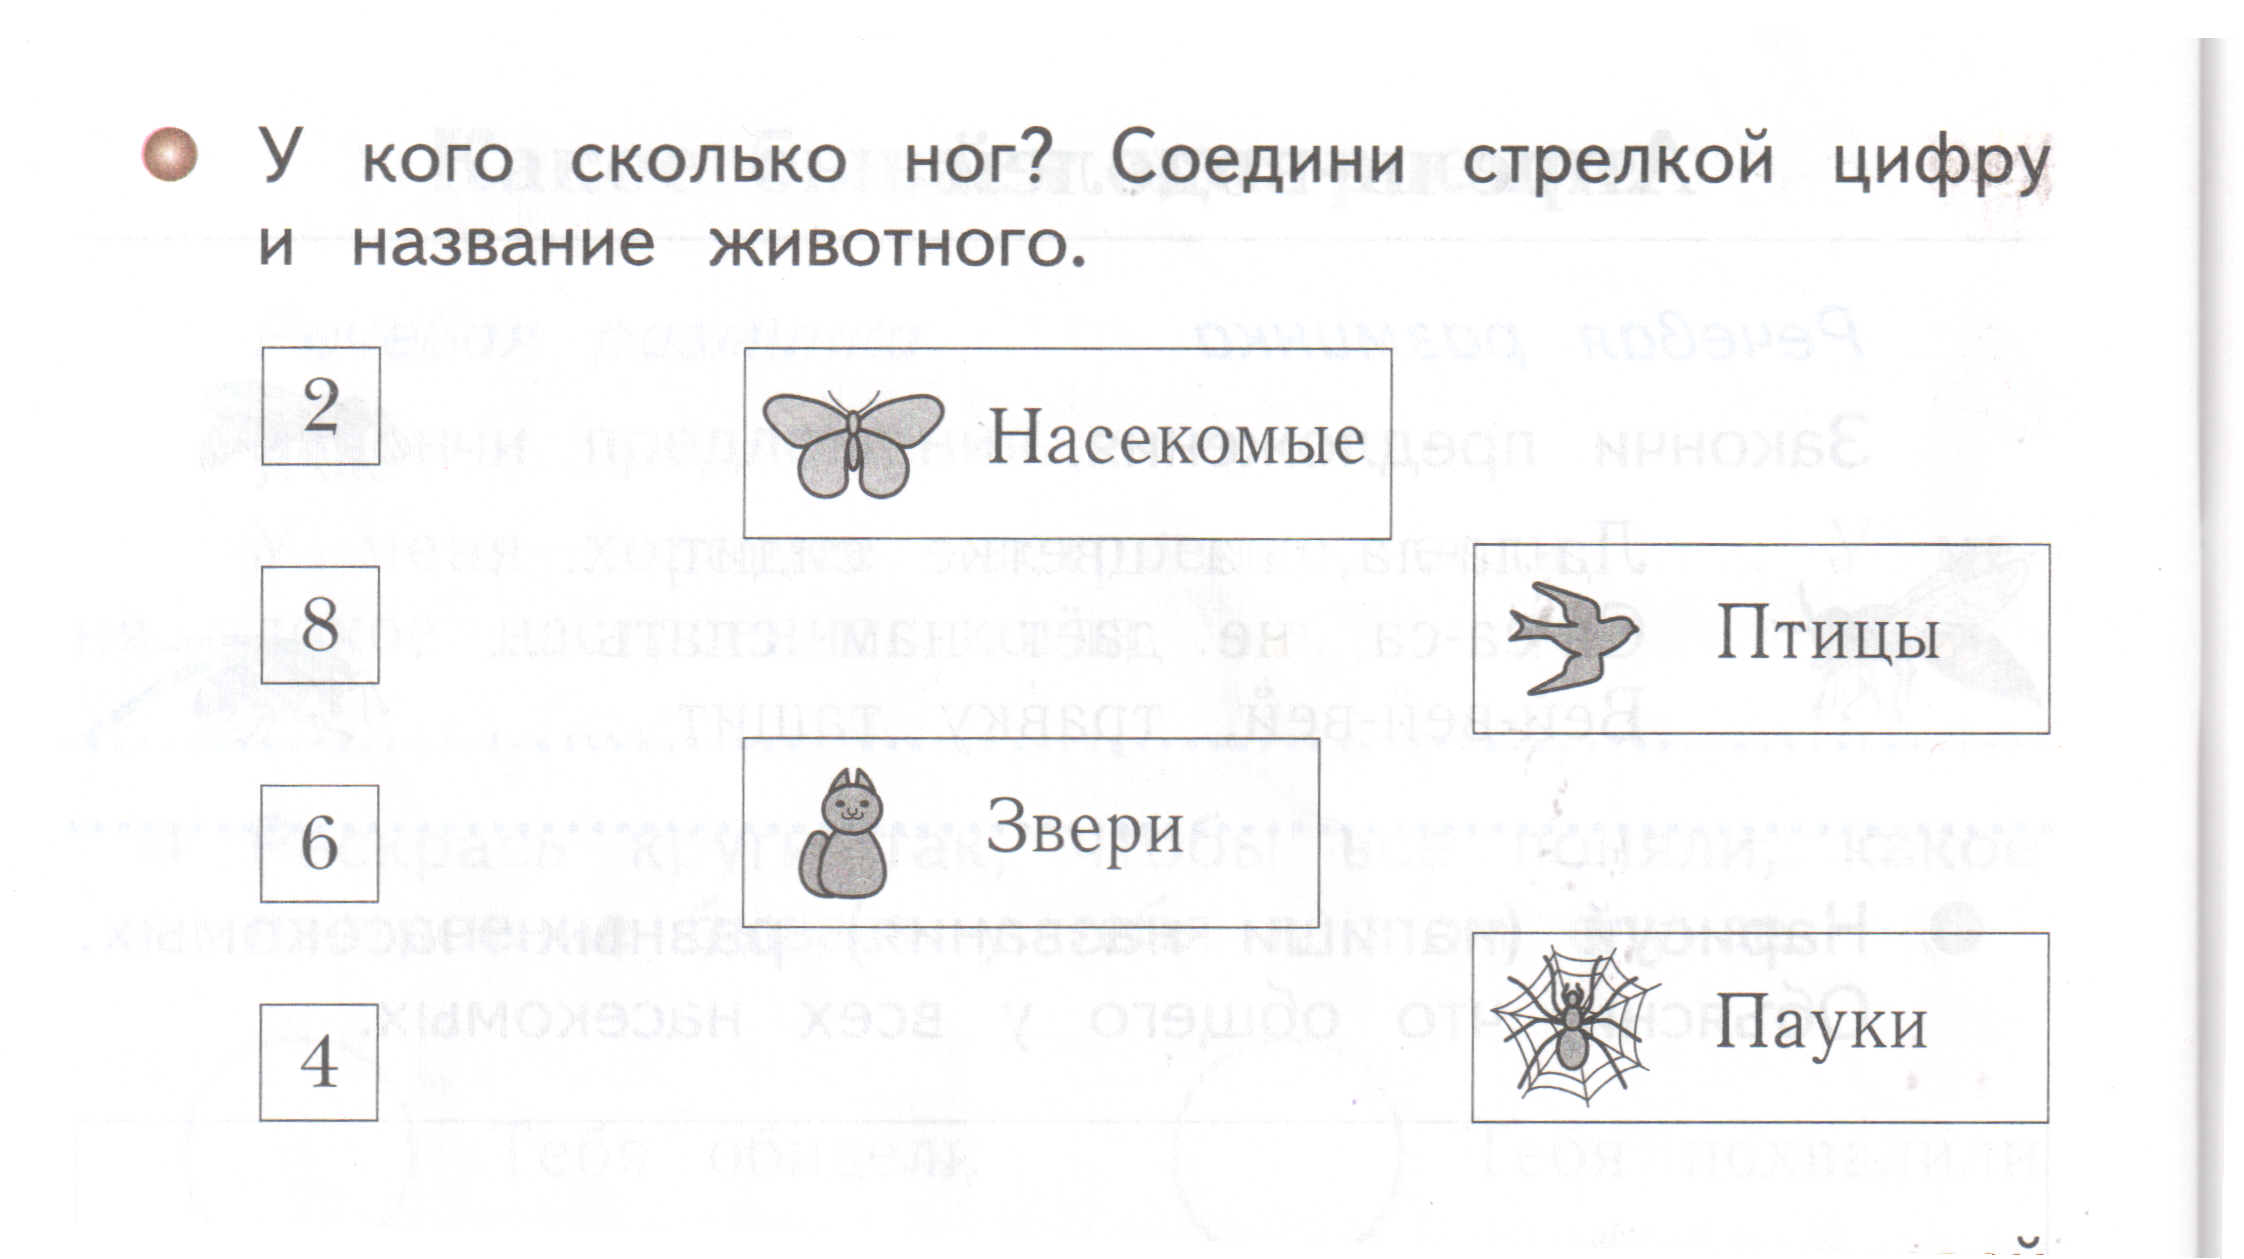 C:\Documents and Settings\Admin\Рабочий стол\Отсканировано 26.04.2012 23-50_000.jpg